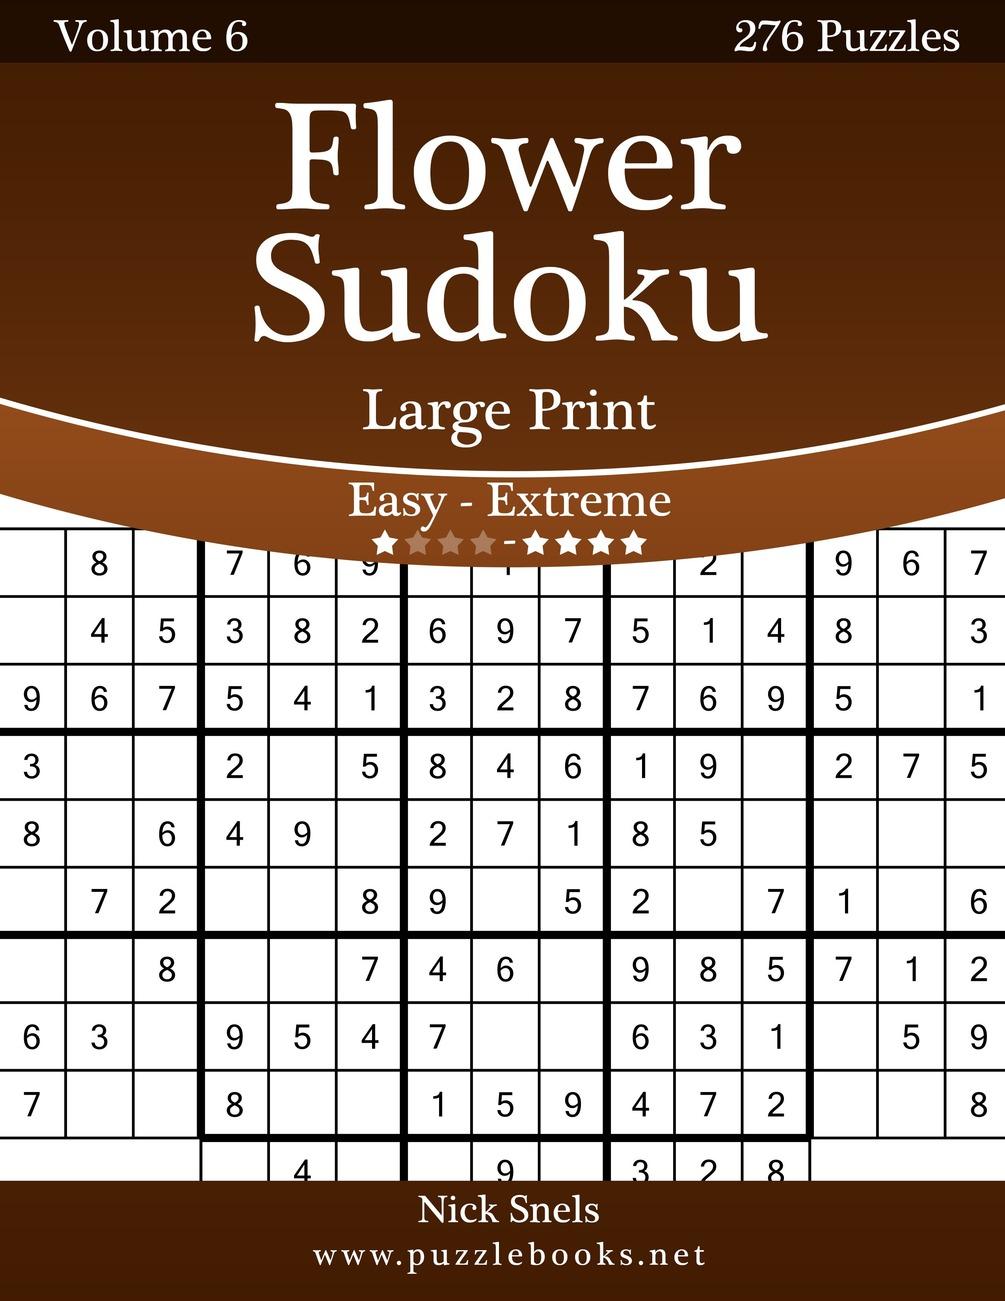 Flower Sudoku Large Print - Easy To Extreme - Volume 6 - 276 Logic Puzzles